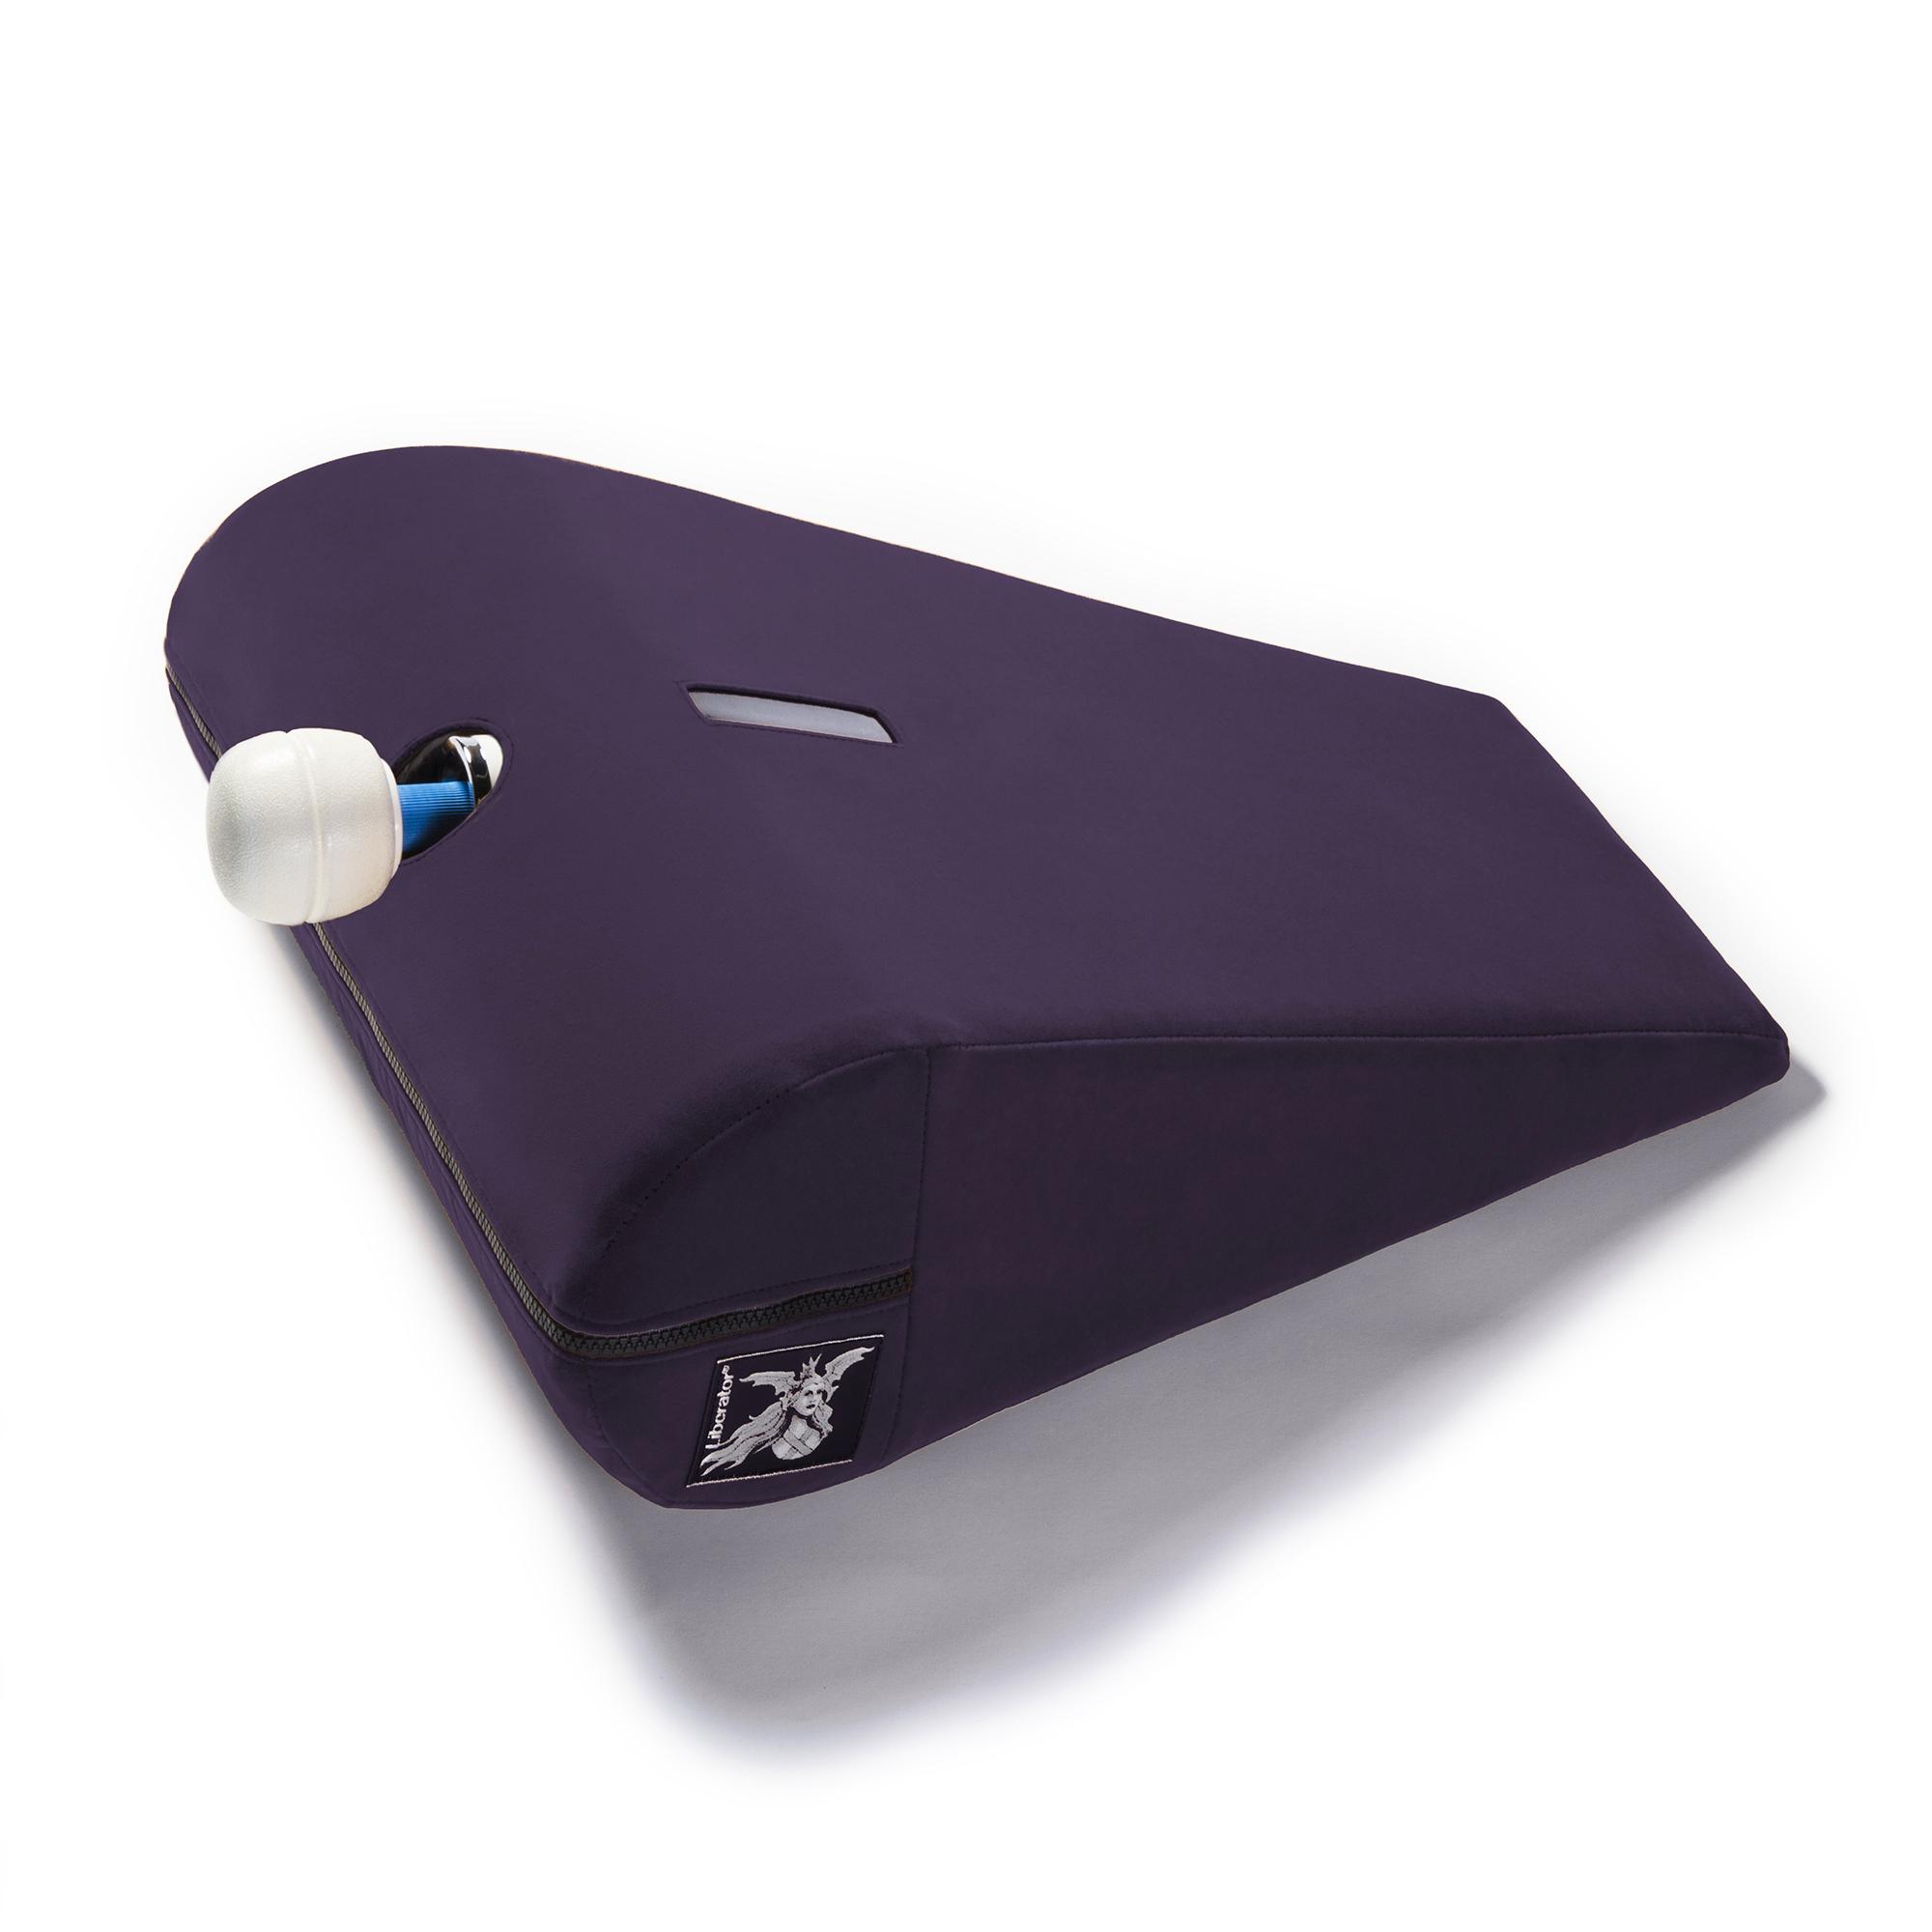 Axis-Magic Wand - Purple | SEXLEKSAKER, MEST FÖR HENNE, Magic Massager Wands, Brands, Liberator, MEST FÖR PARLEKAR, Sexmöbler & Sängkläder | Intimast.se - Sexleksaker